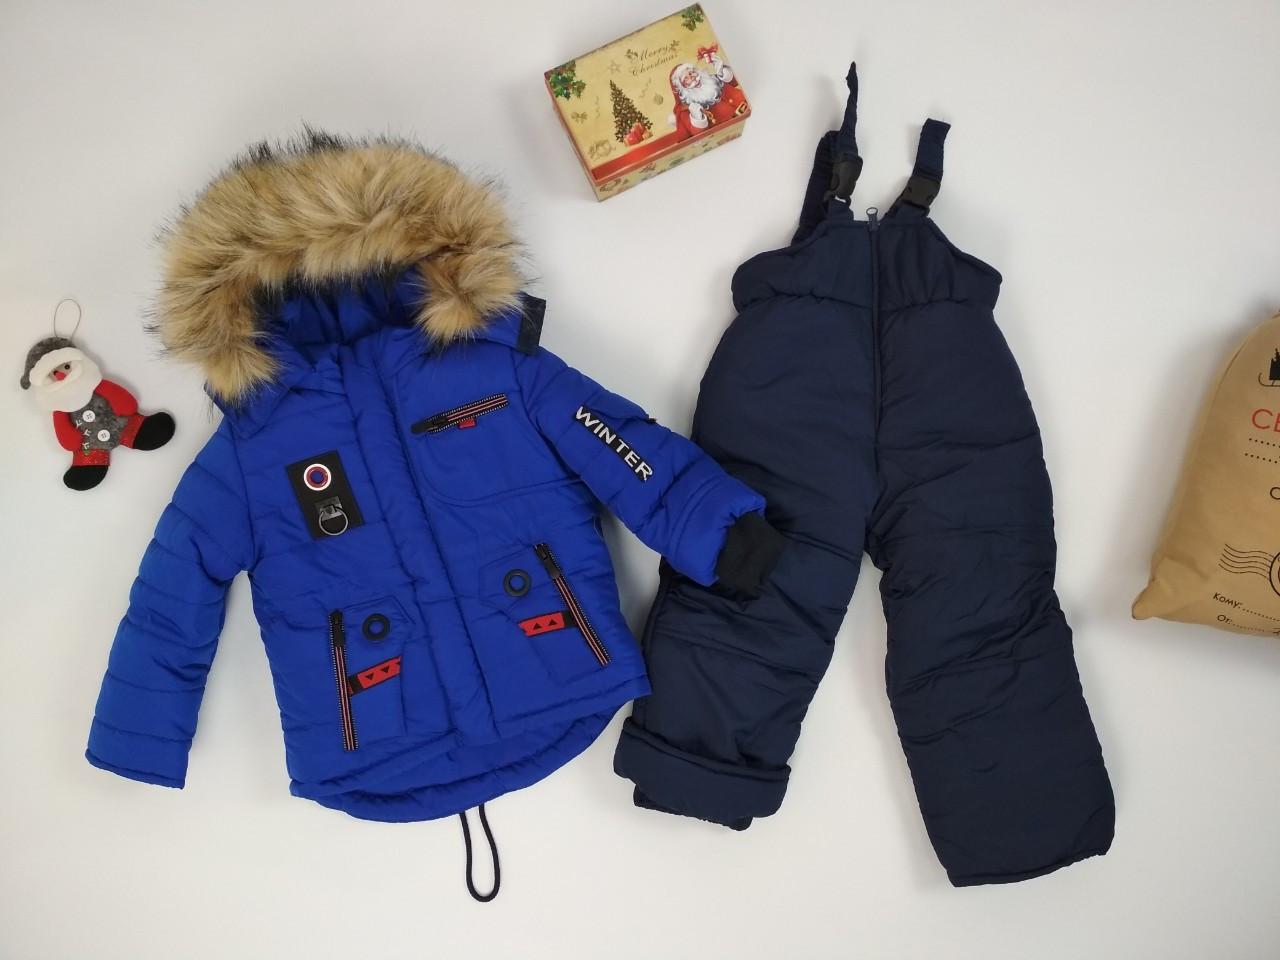 Зимний костюм куртка и комбинезон цвет электрик для мальчика 86-116 р